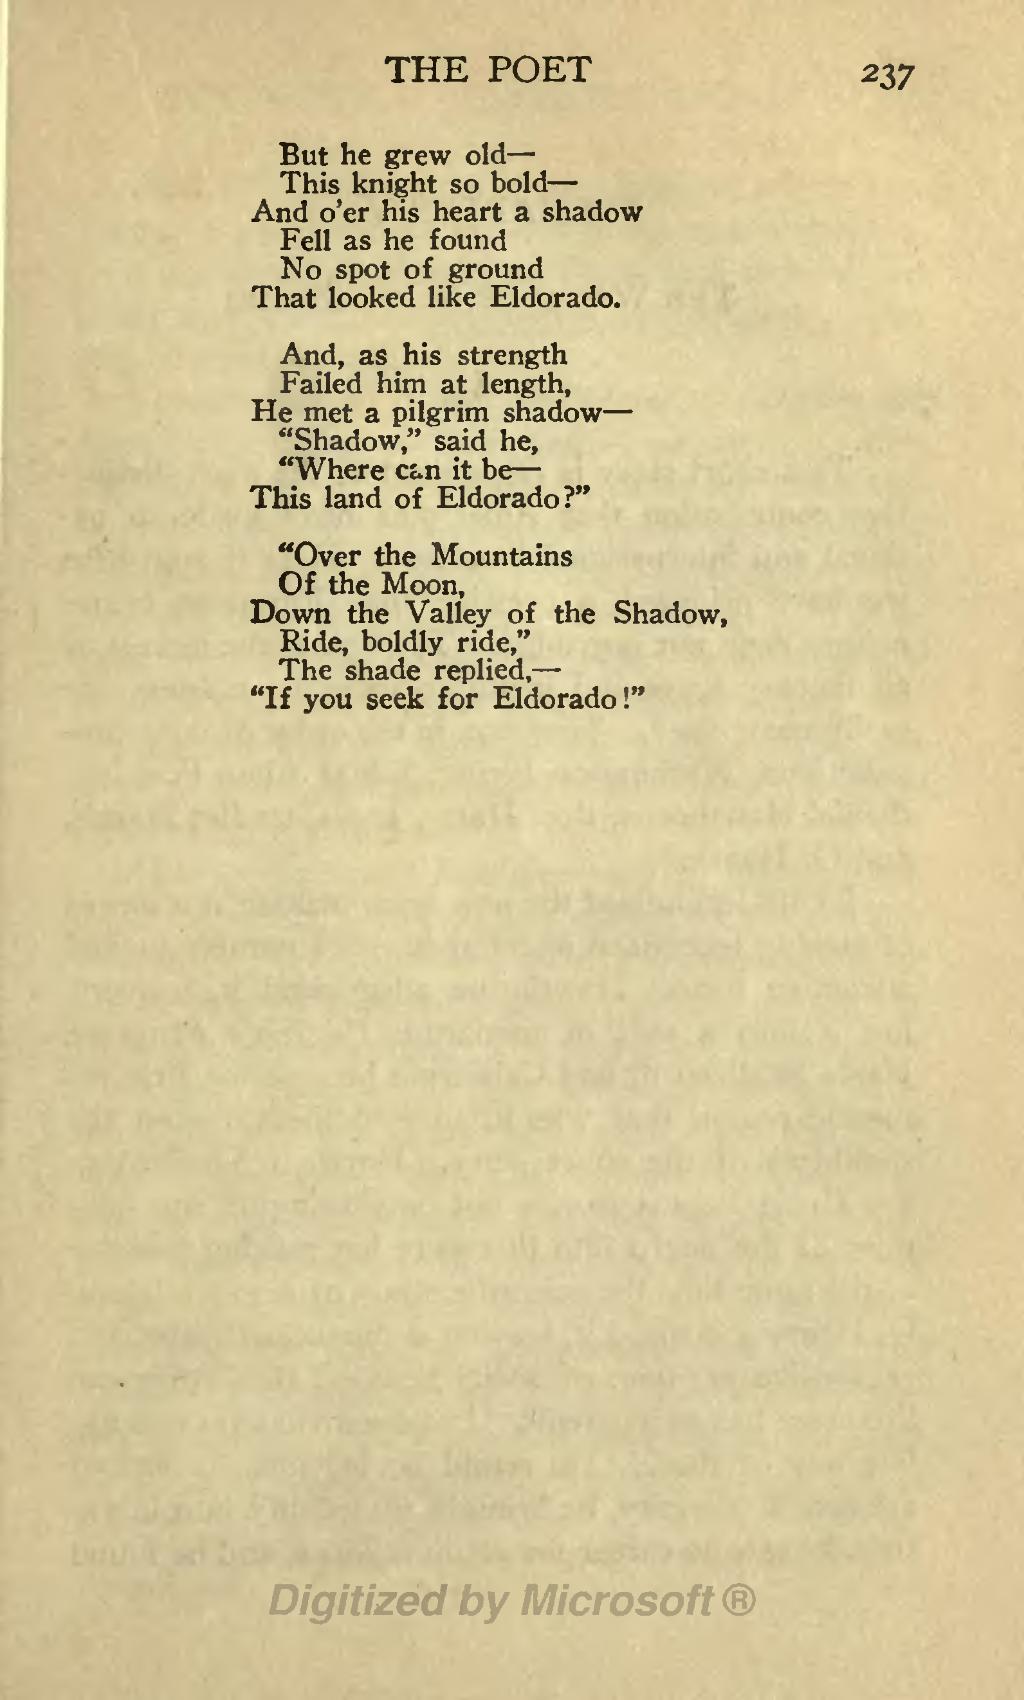 Poe Poems - Keywordsfind.com